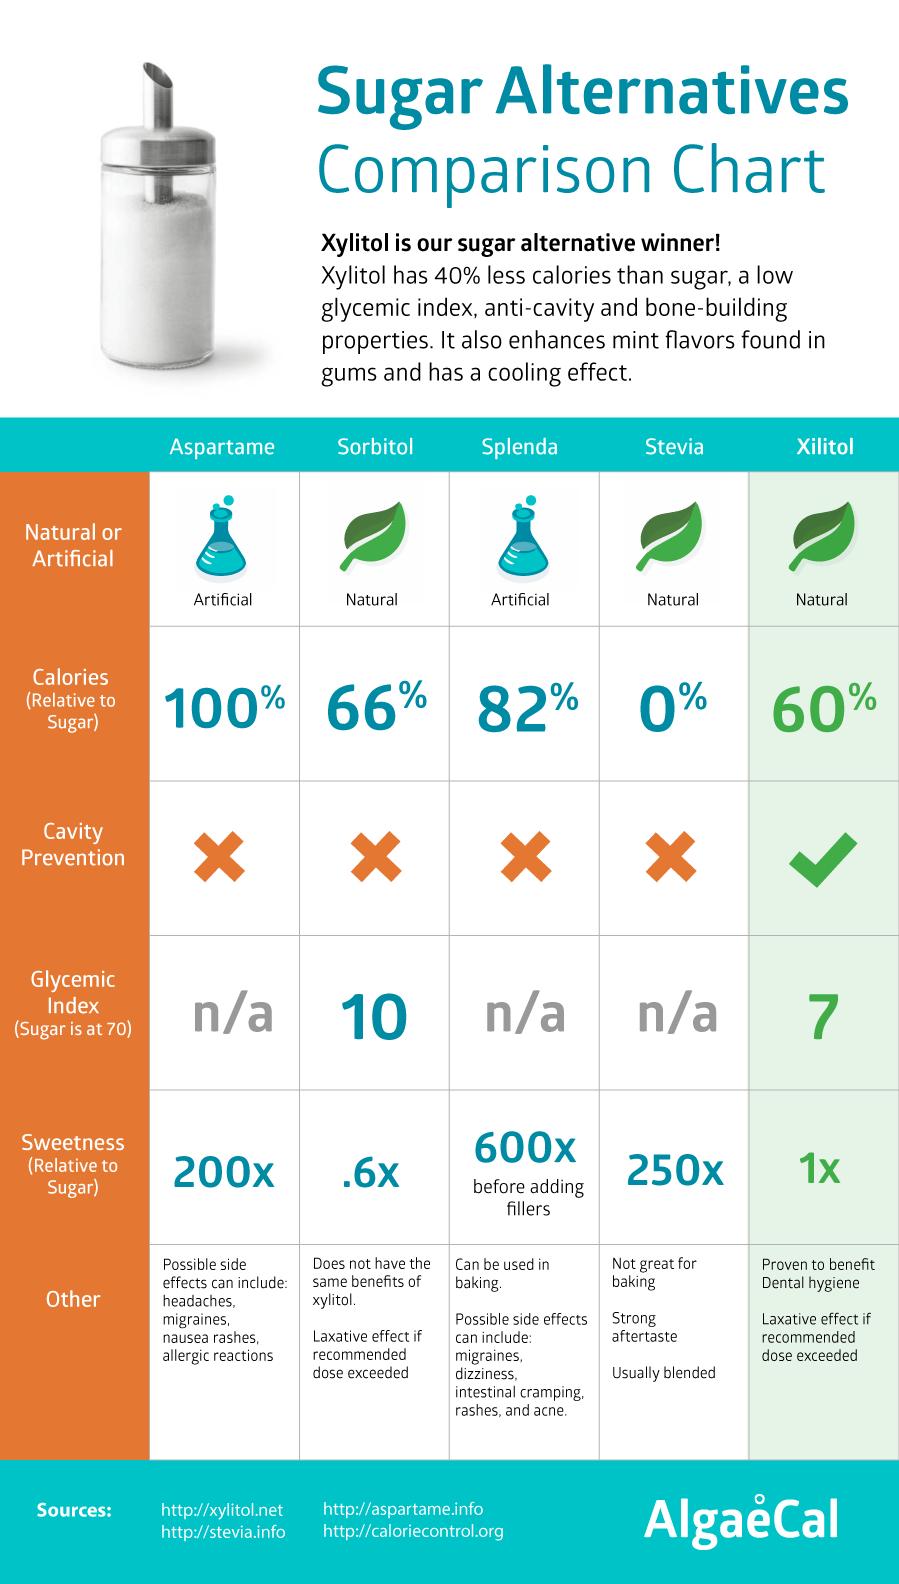 xylitol sugar comparisons chart